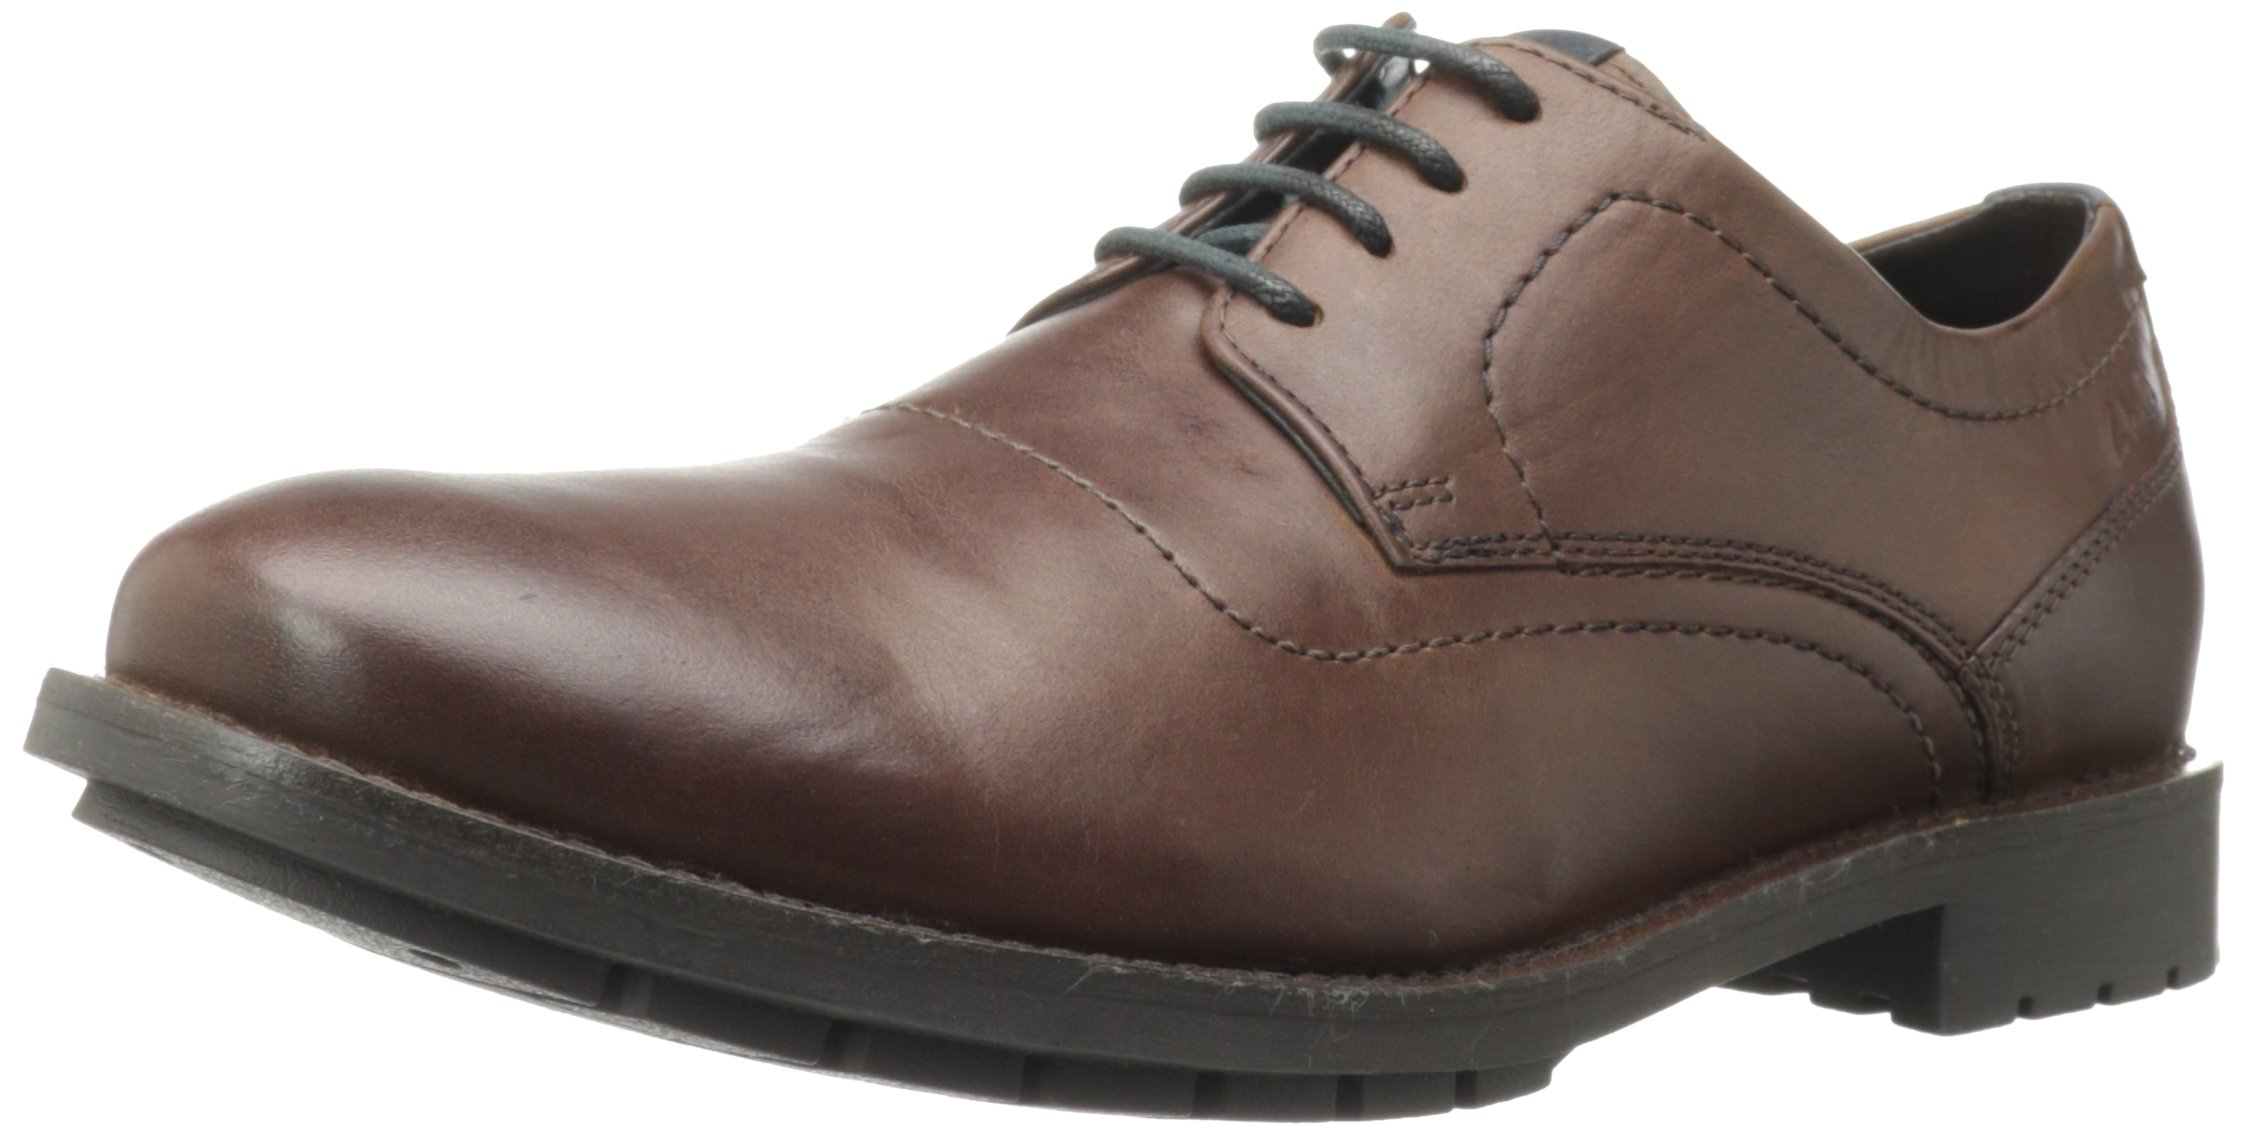 Giầy Clarks Men's Garnet Walk Oxford, Size 12 US - 46 EU màu Tan Leather